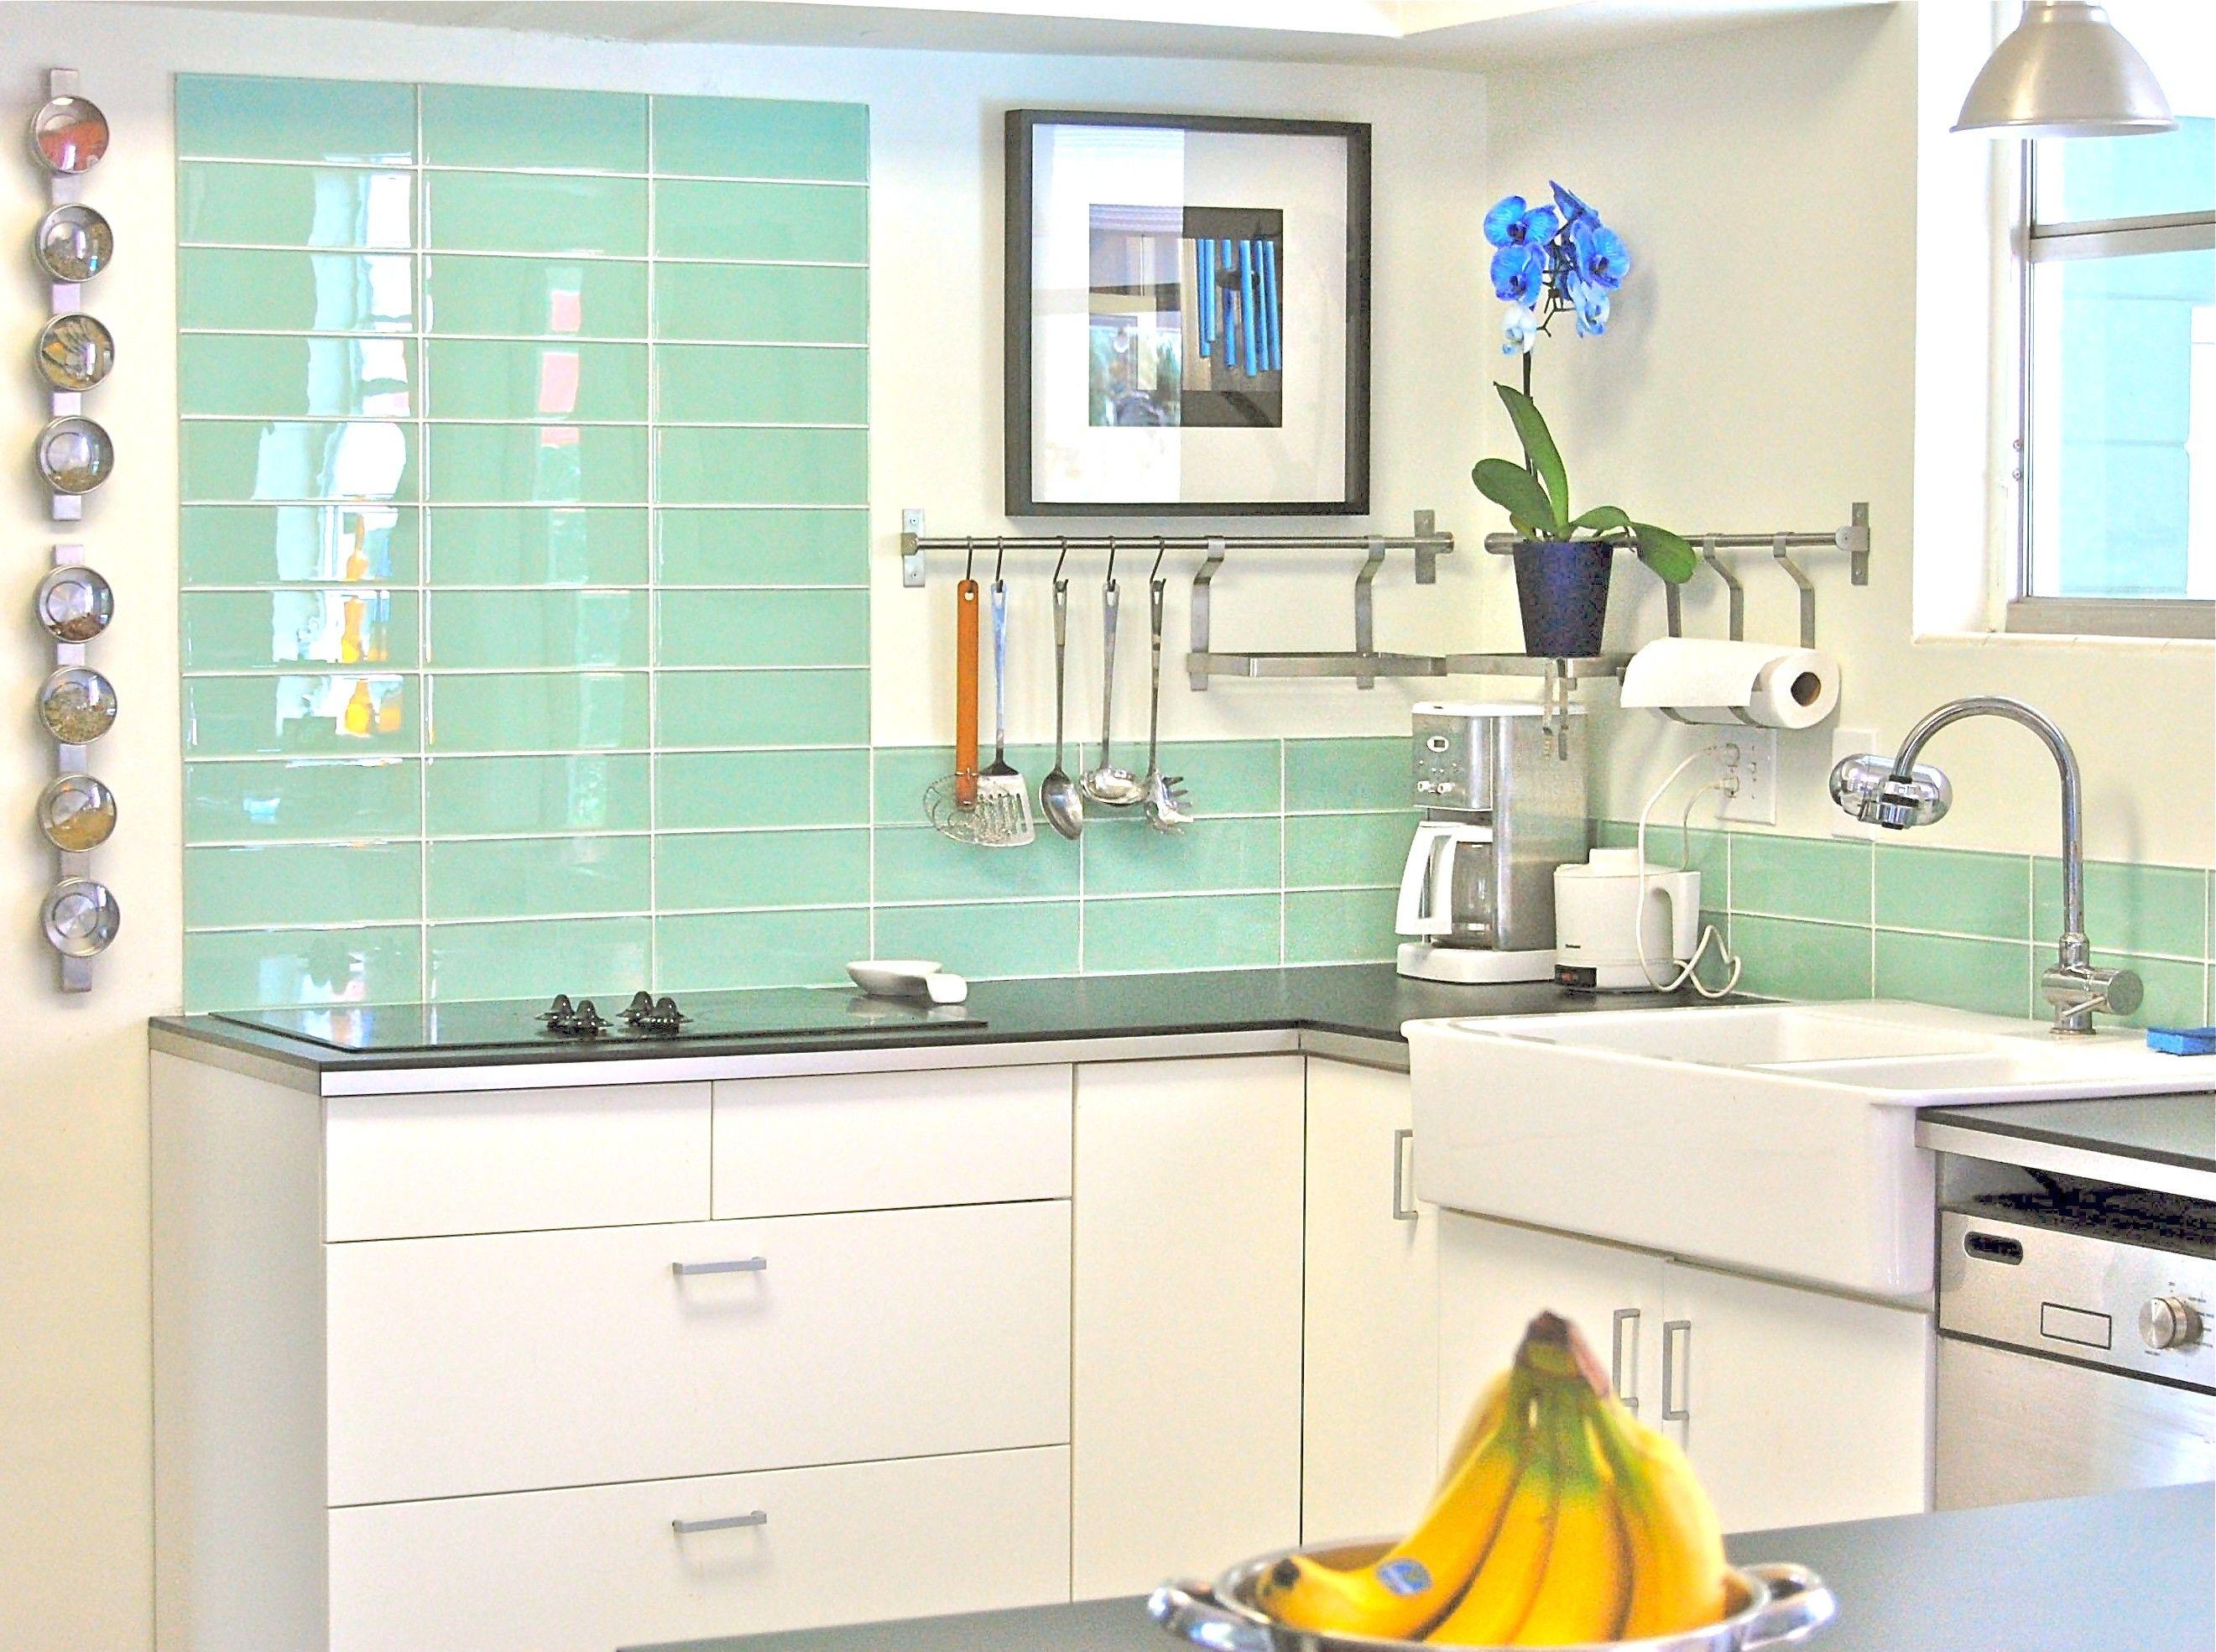 kitchen seafoam green tile backsplash counter Yahoo Image